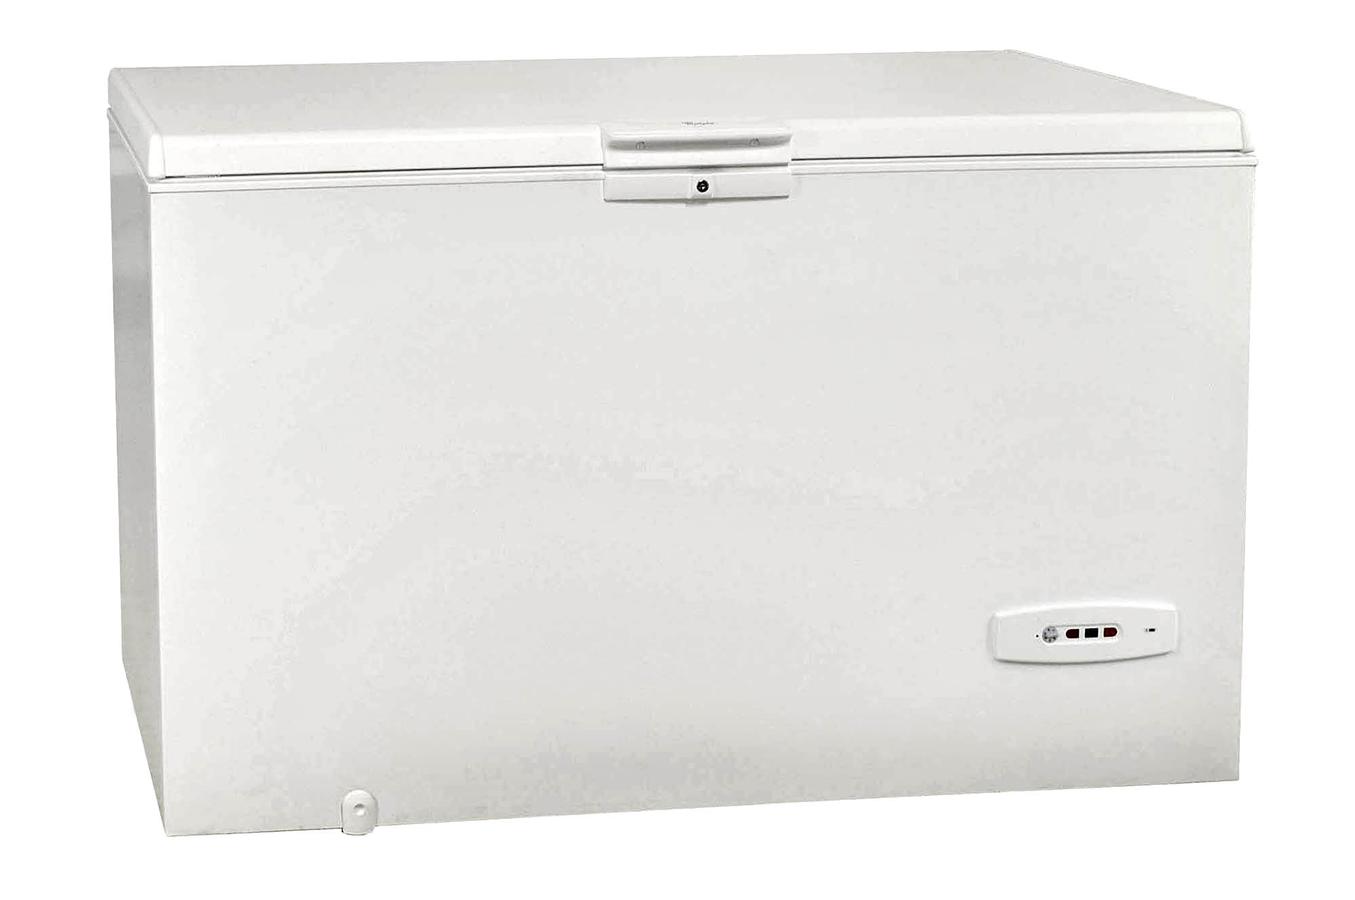 cong lateur coffre whirlpool afg 6512 b afg6512b 2320967 darty. Black Bedroom Furniture Sets. Home Design Ideas